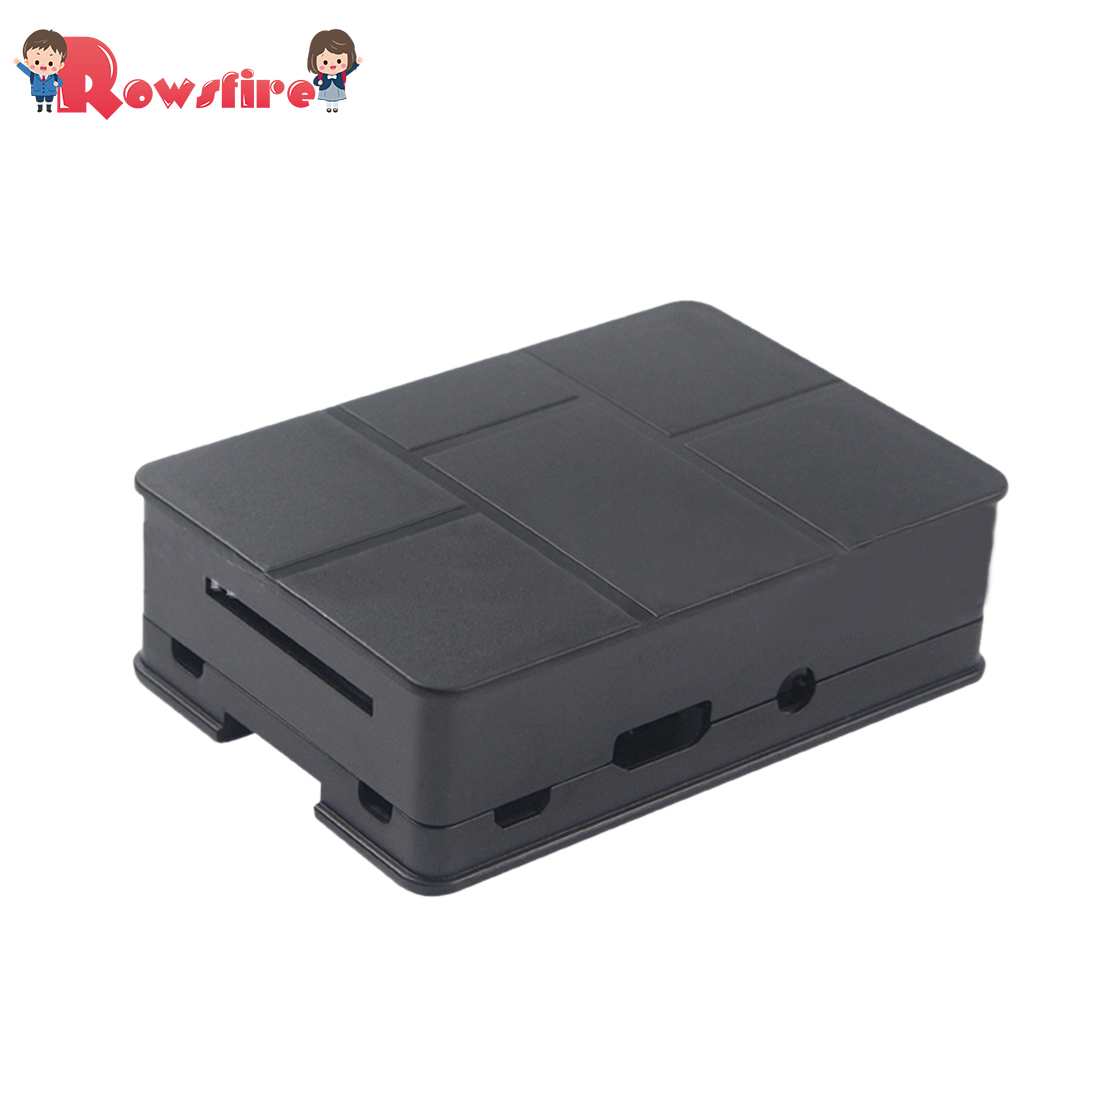 Protective Cover Plastic Shell For Raspberry Pi 3B+/3B/2B - Black